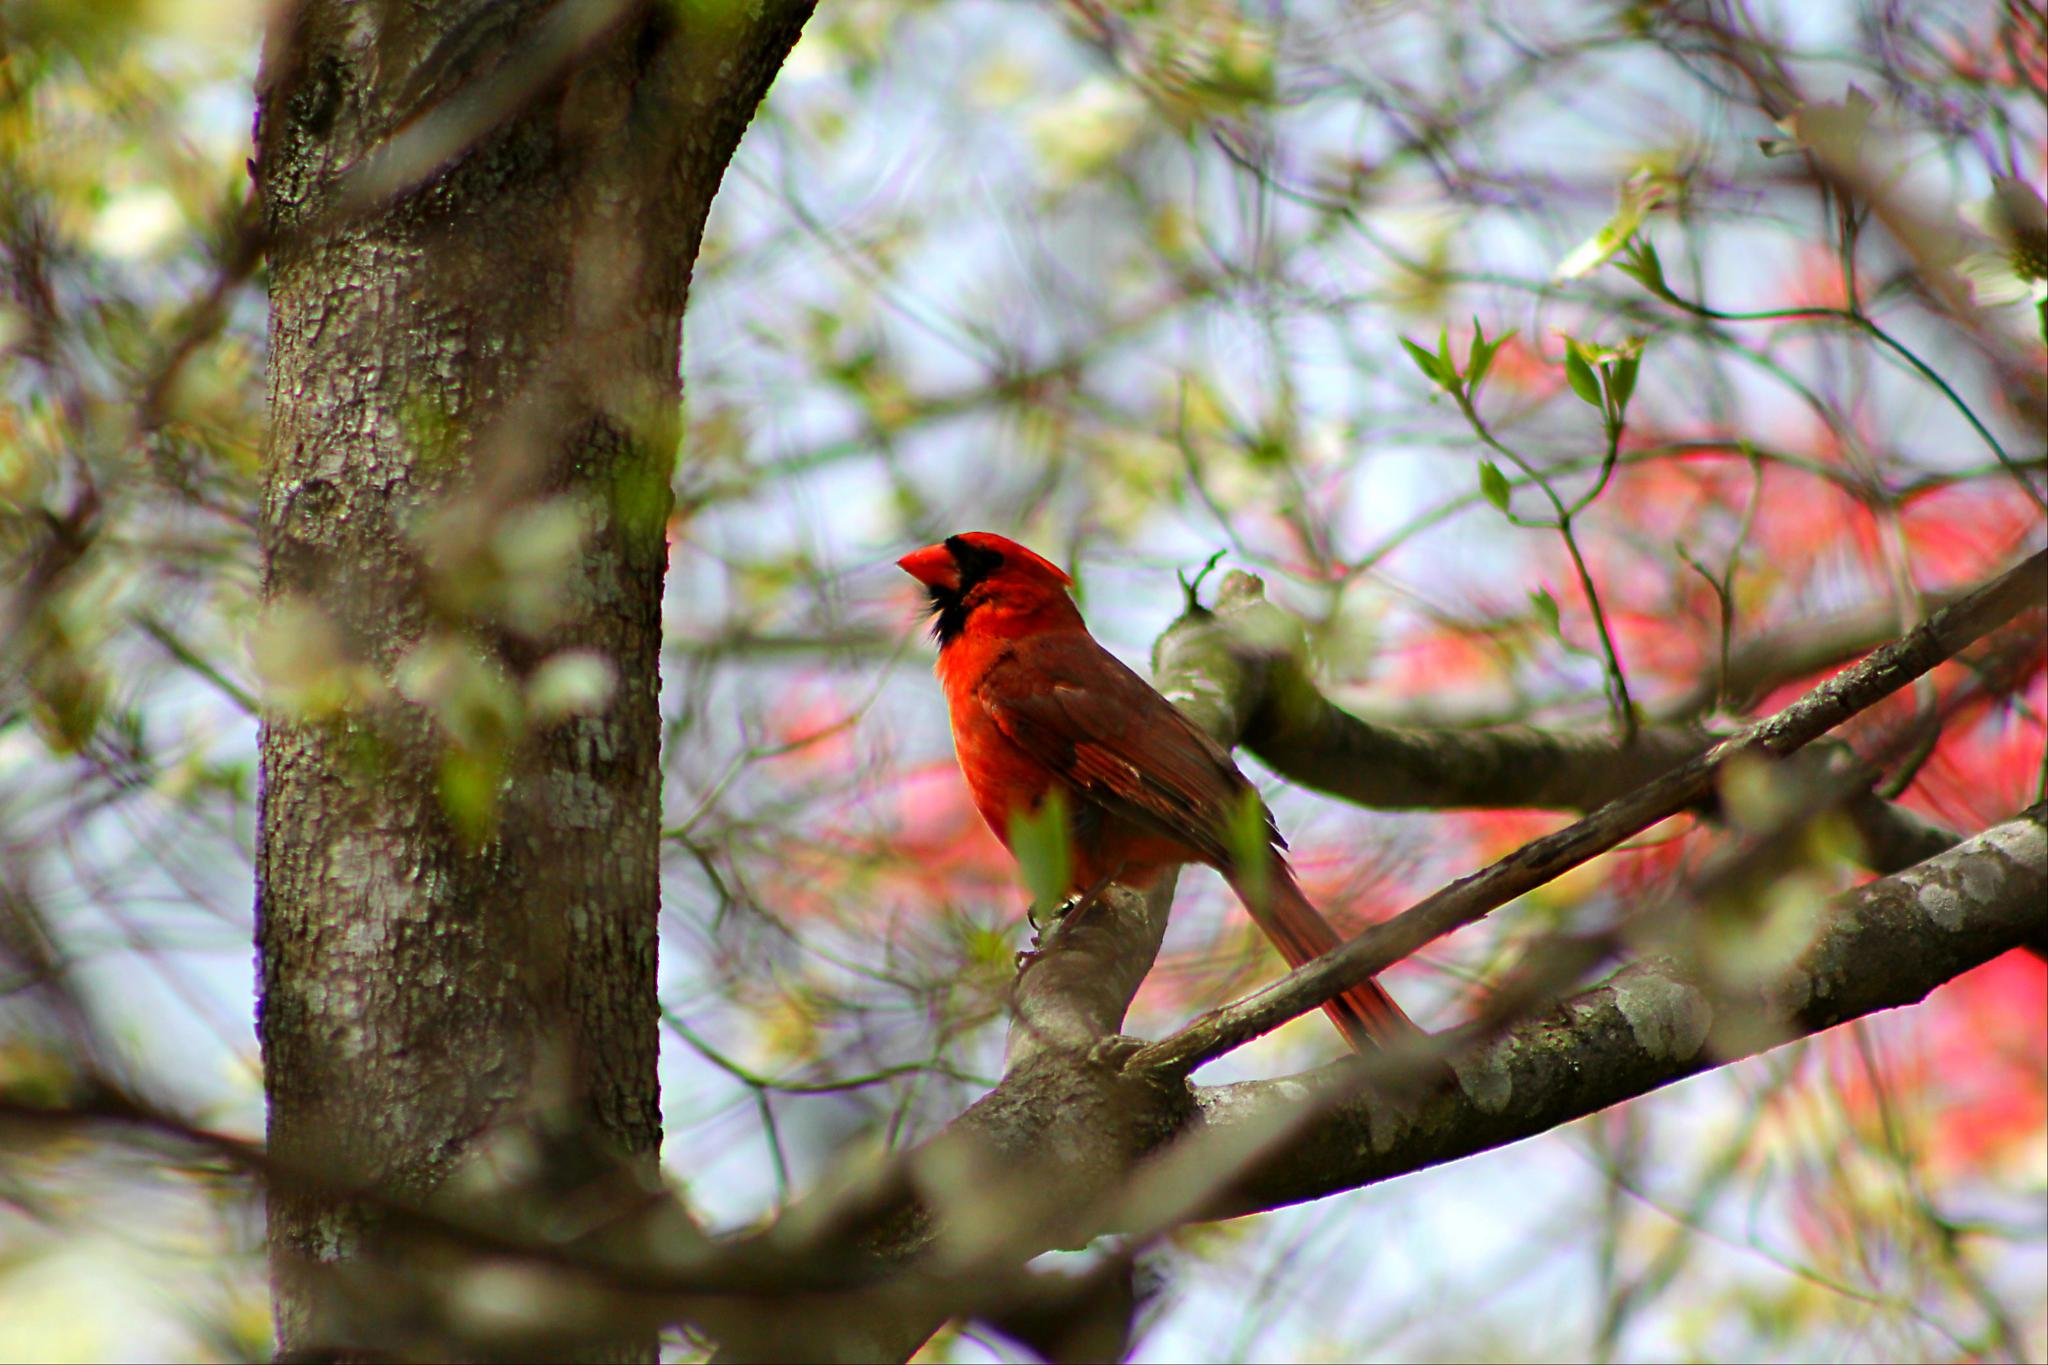 Red Cardinal by darlenehoneycutt